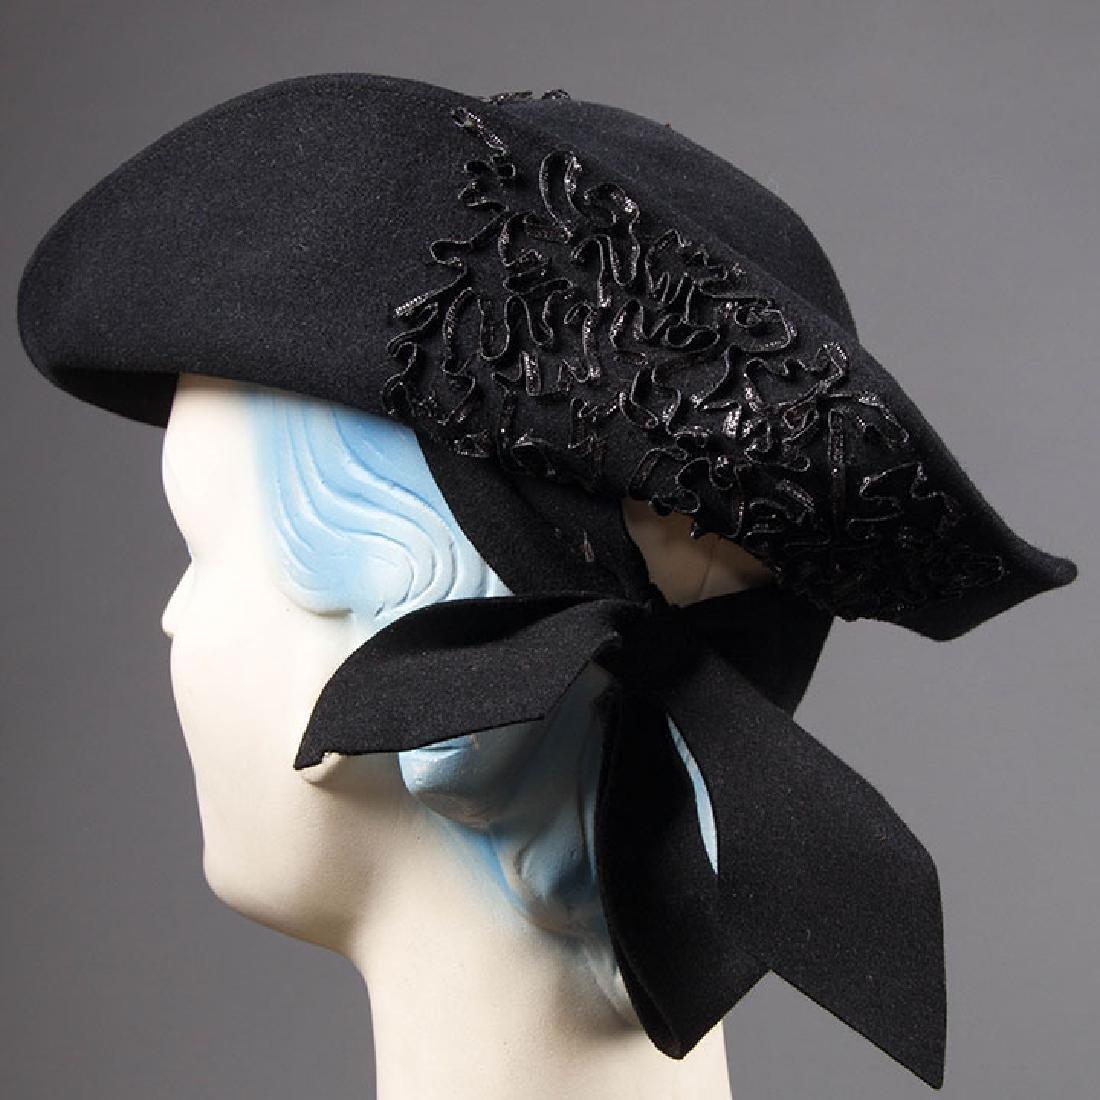 5 UNUSUAL SHAPED FELT HATS, 1930-EARLY 1940s - 4